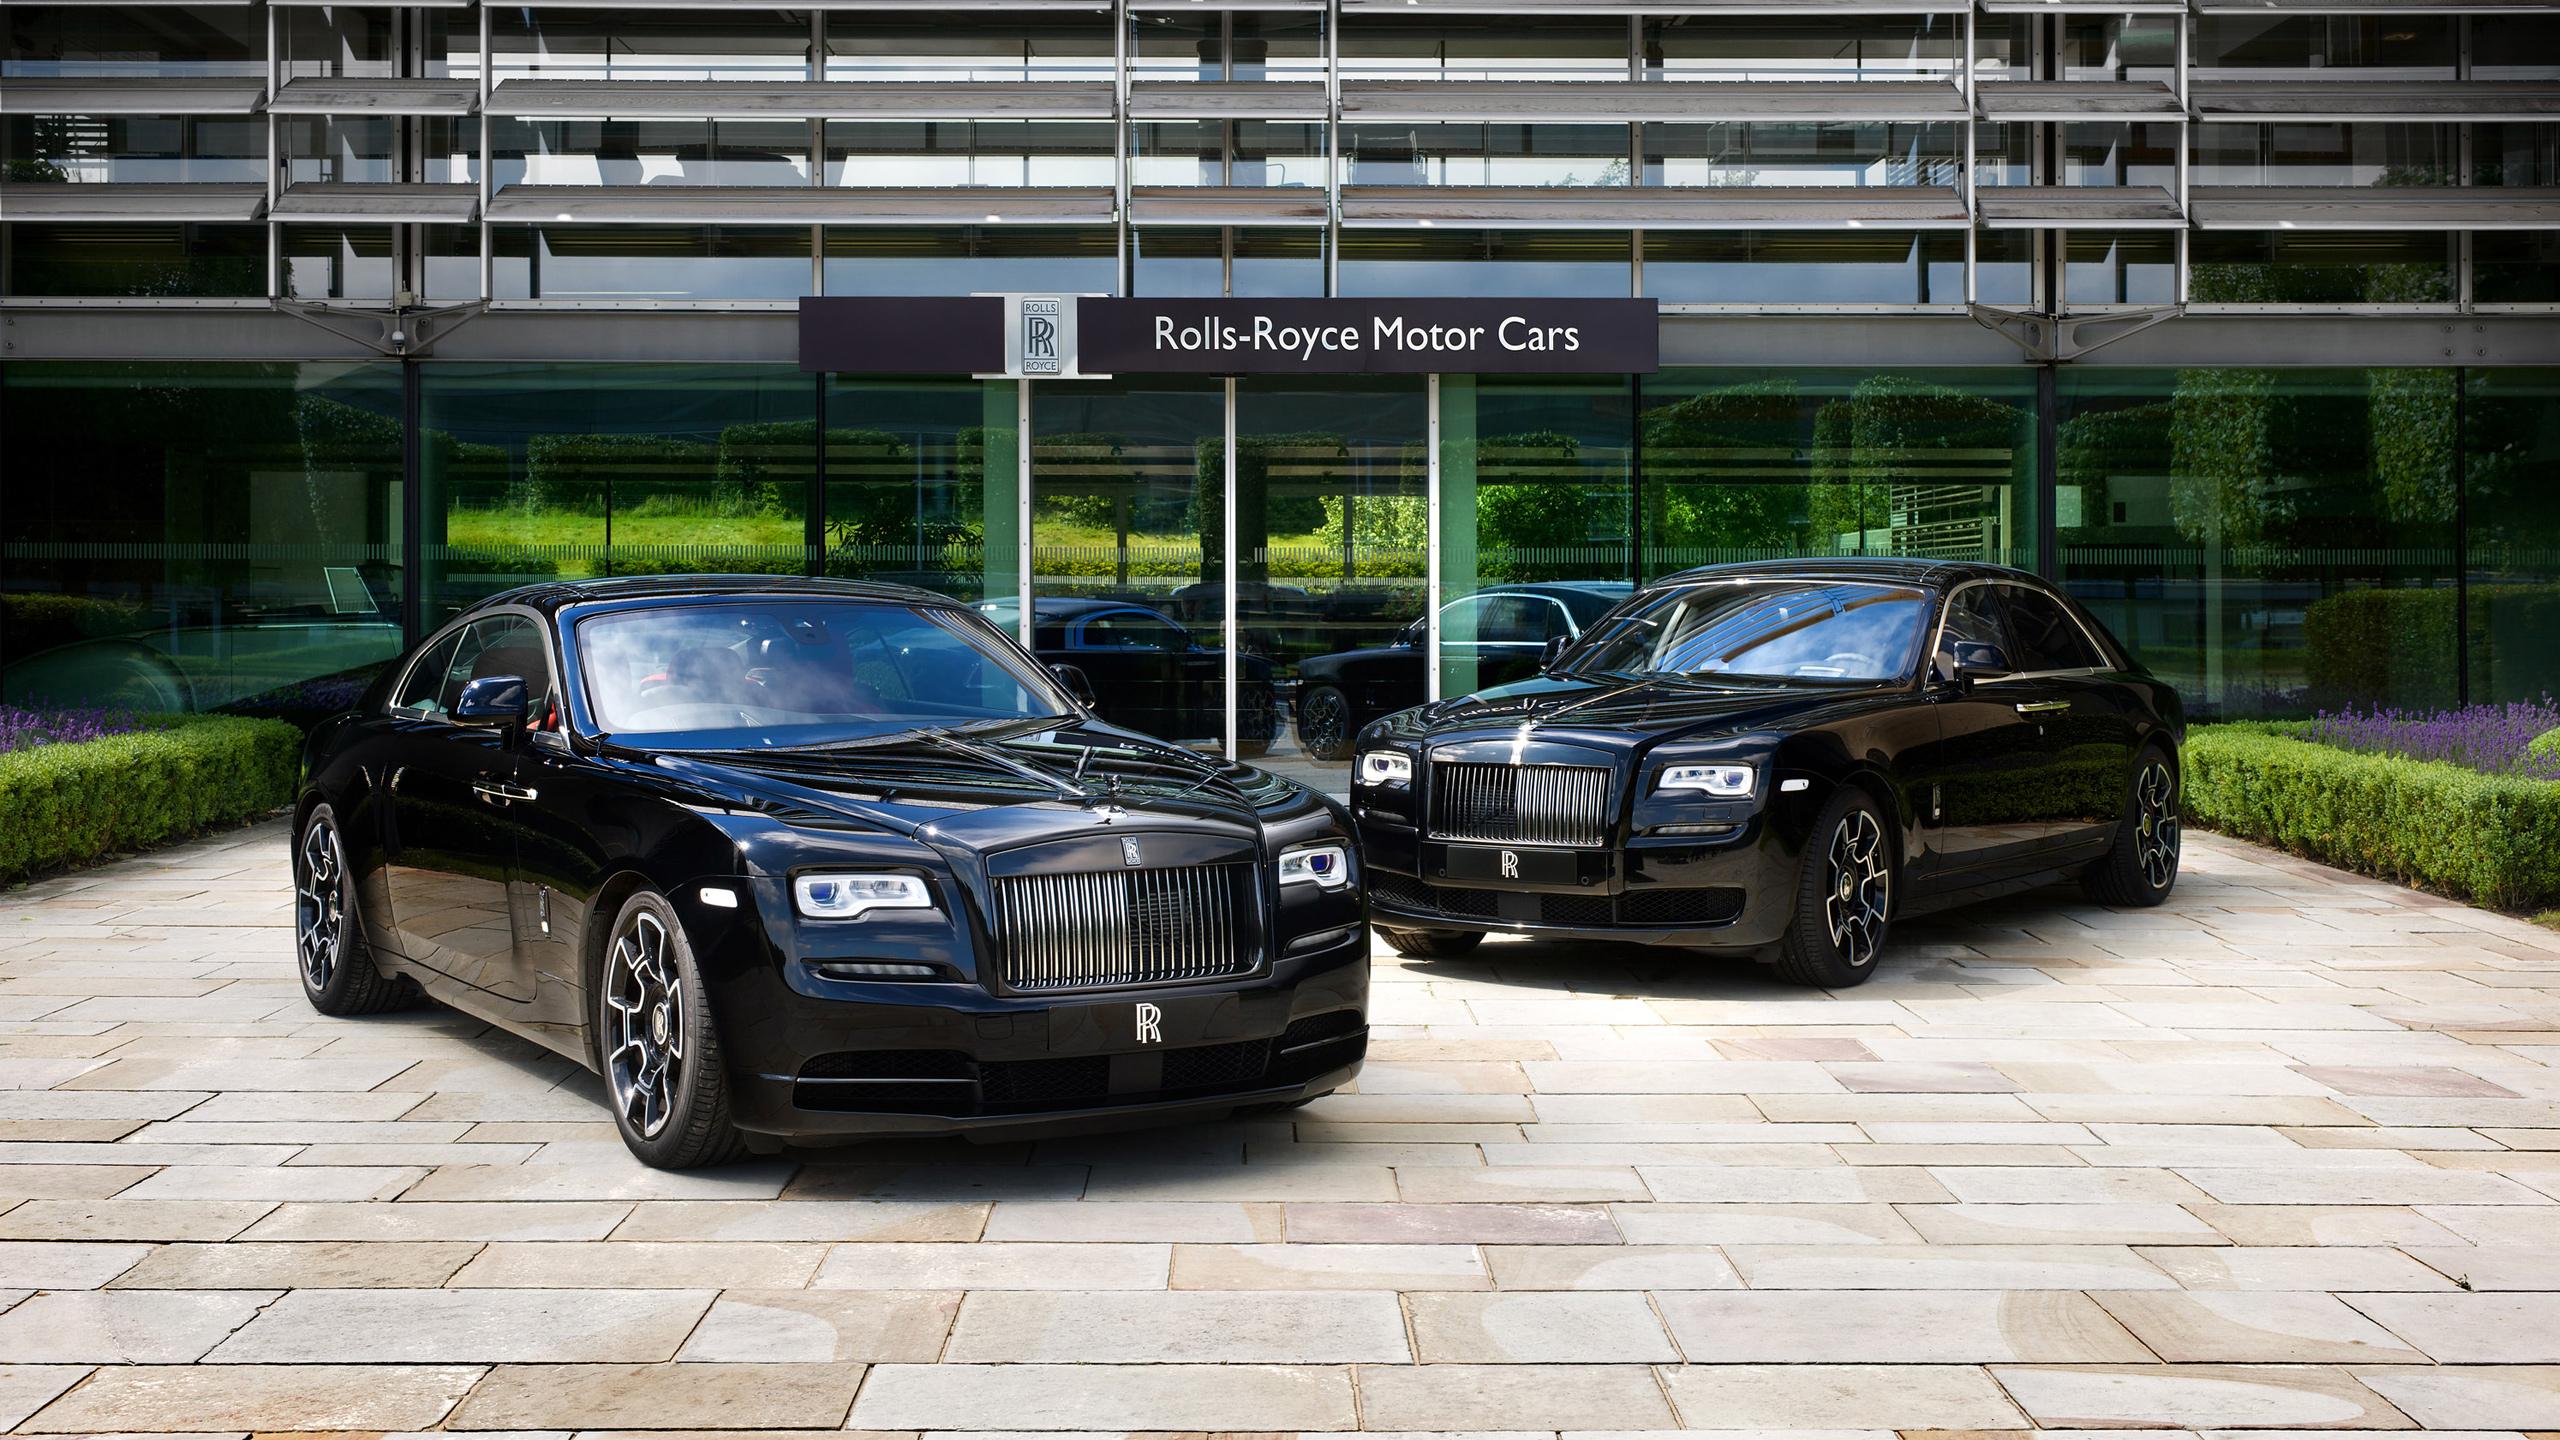 2016 Rolls Royce Wraith Black Badge Ghost Black Badge Wallpaper Hd